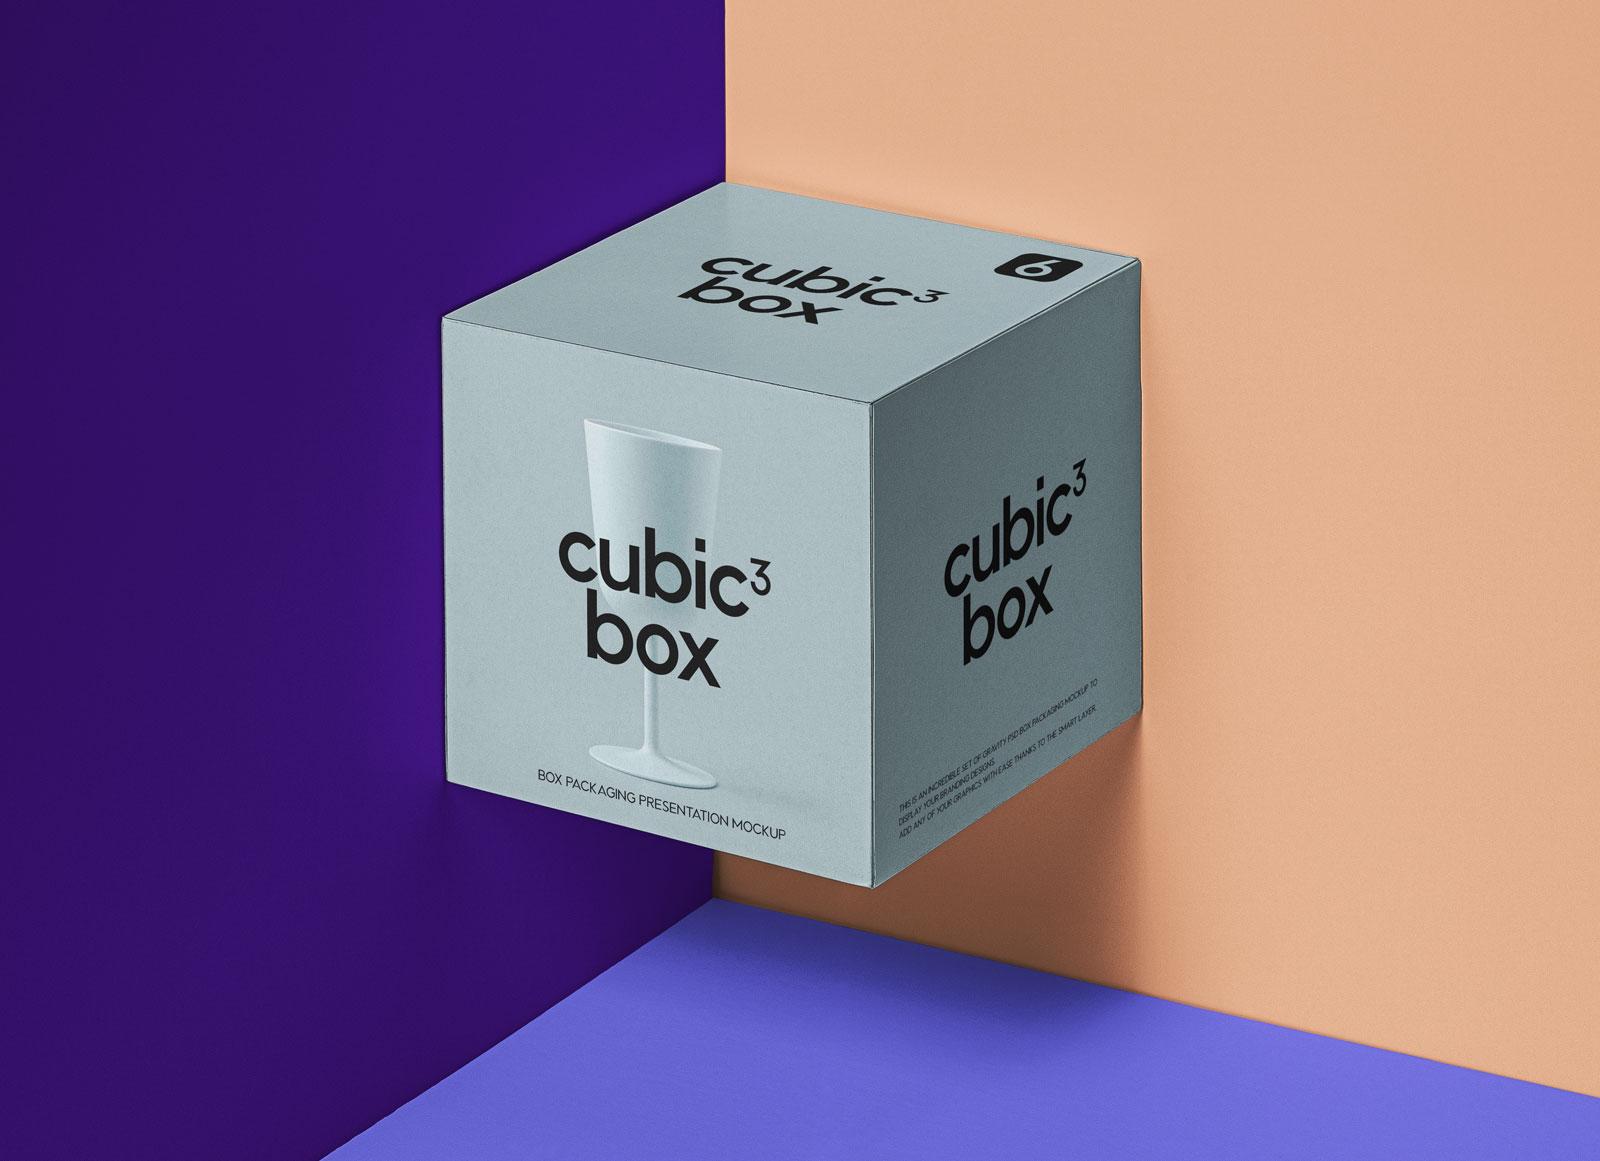 Free Cubic Box-Packaging-Presentation-Mockup PSD